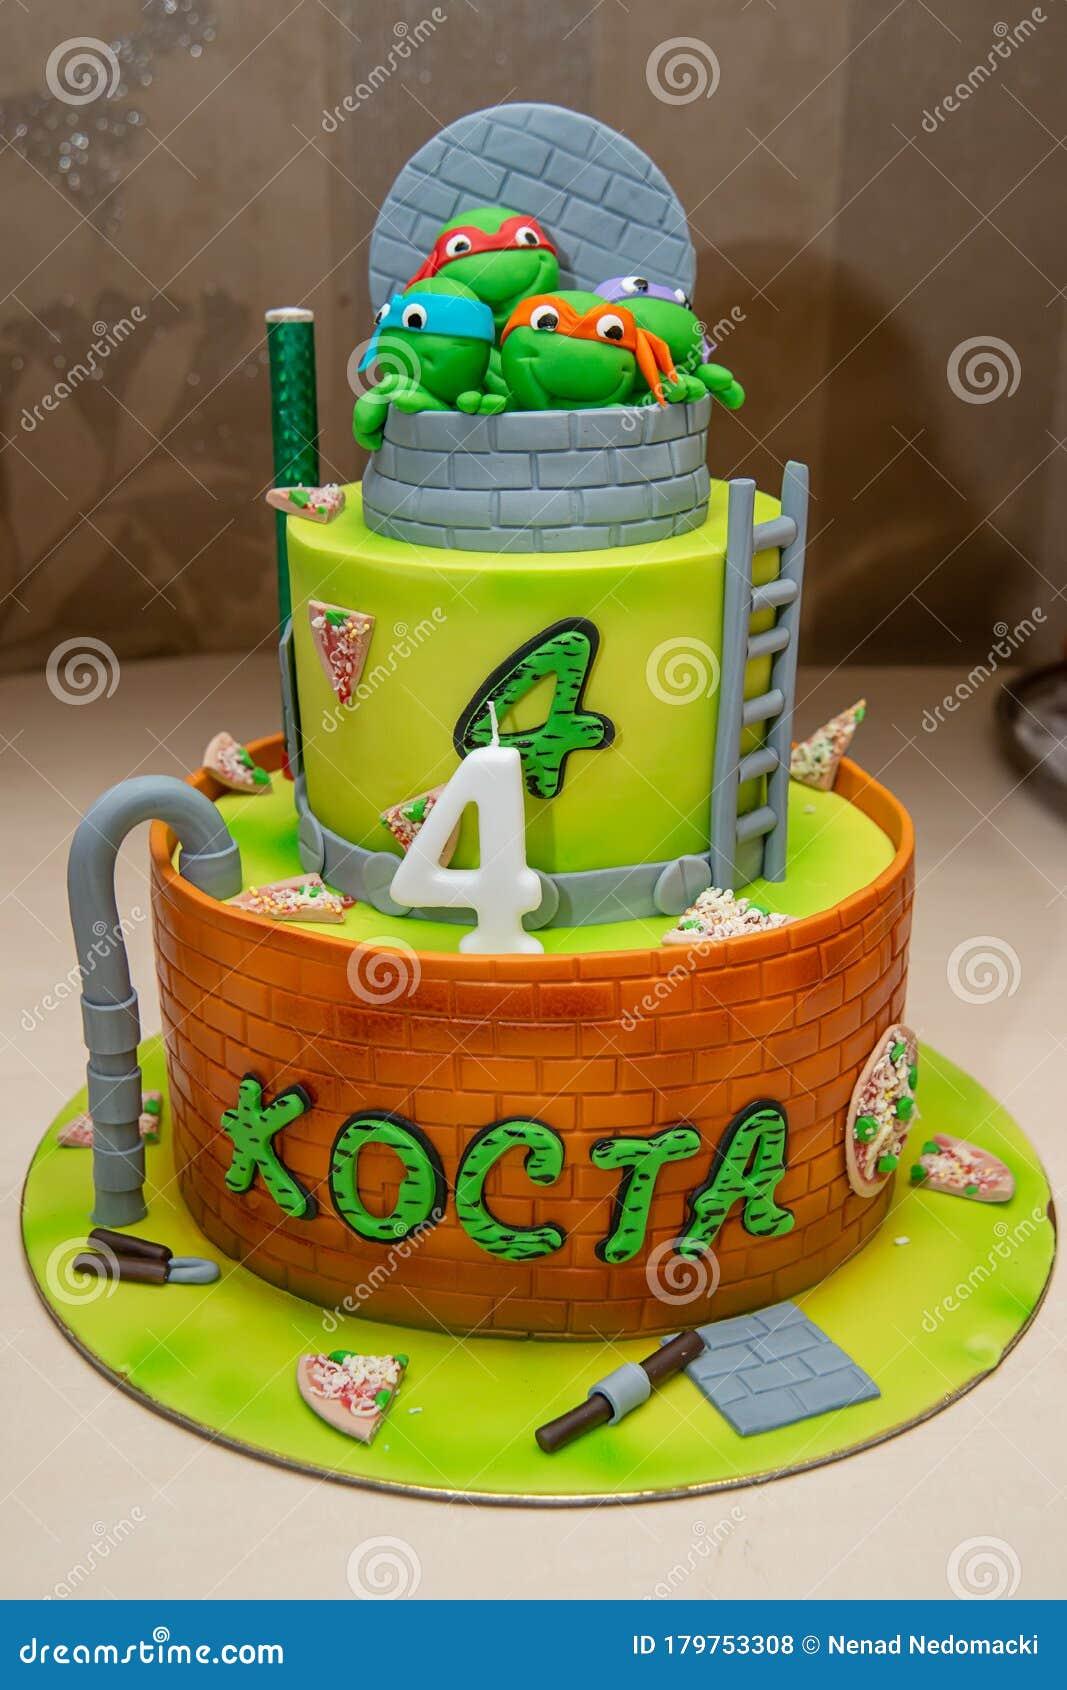 Marvelous Turtles Cake Stock Photos Download 19 Royalty Free Photos Funny Birthday Cards Online Alyptdamsfinfo